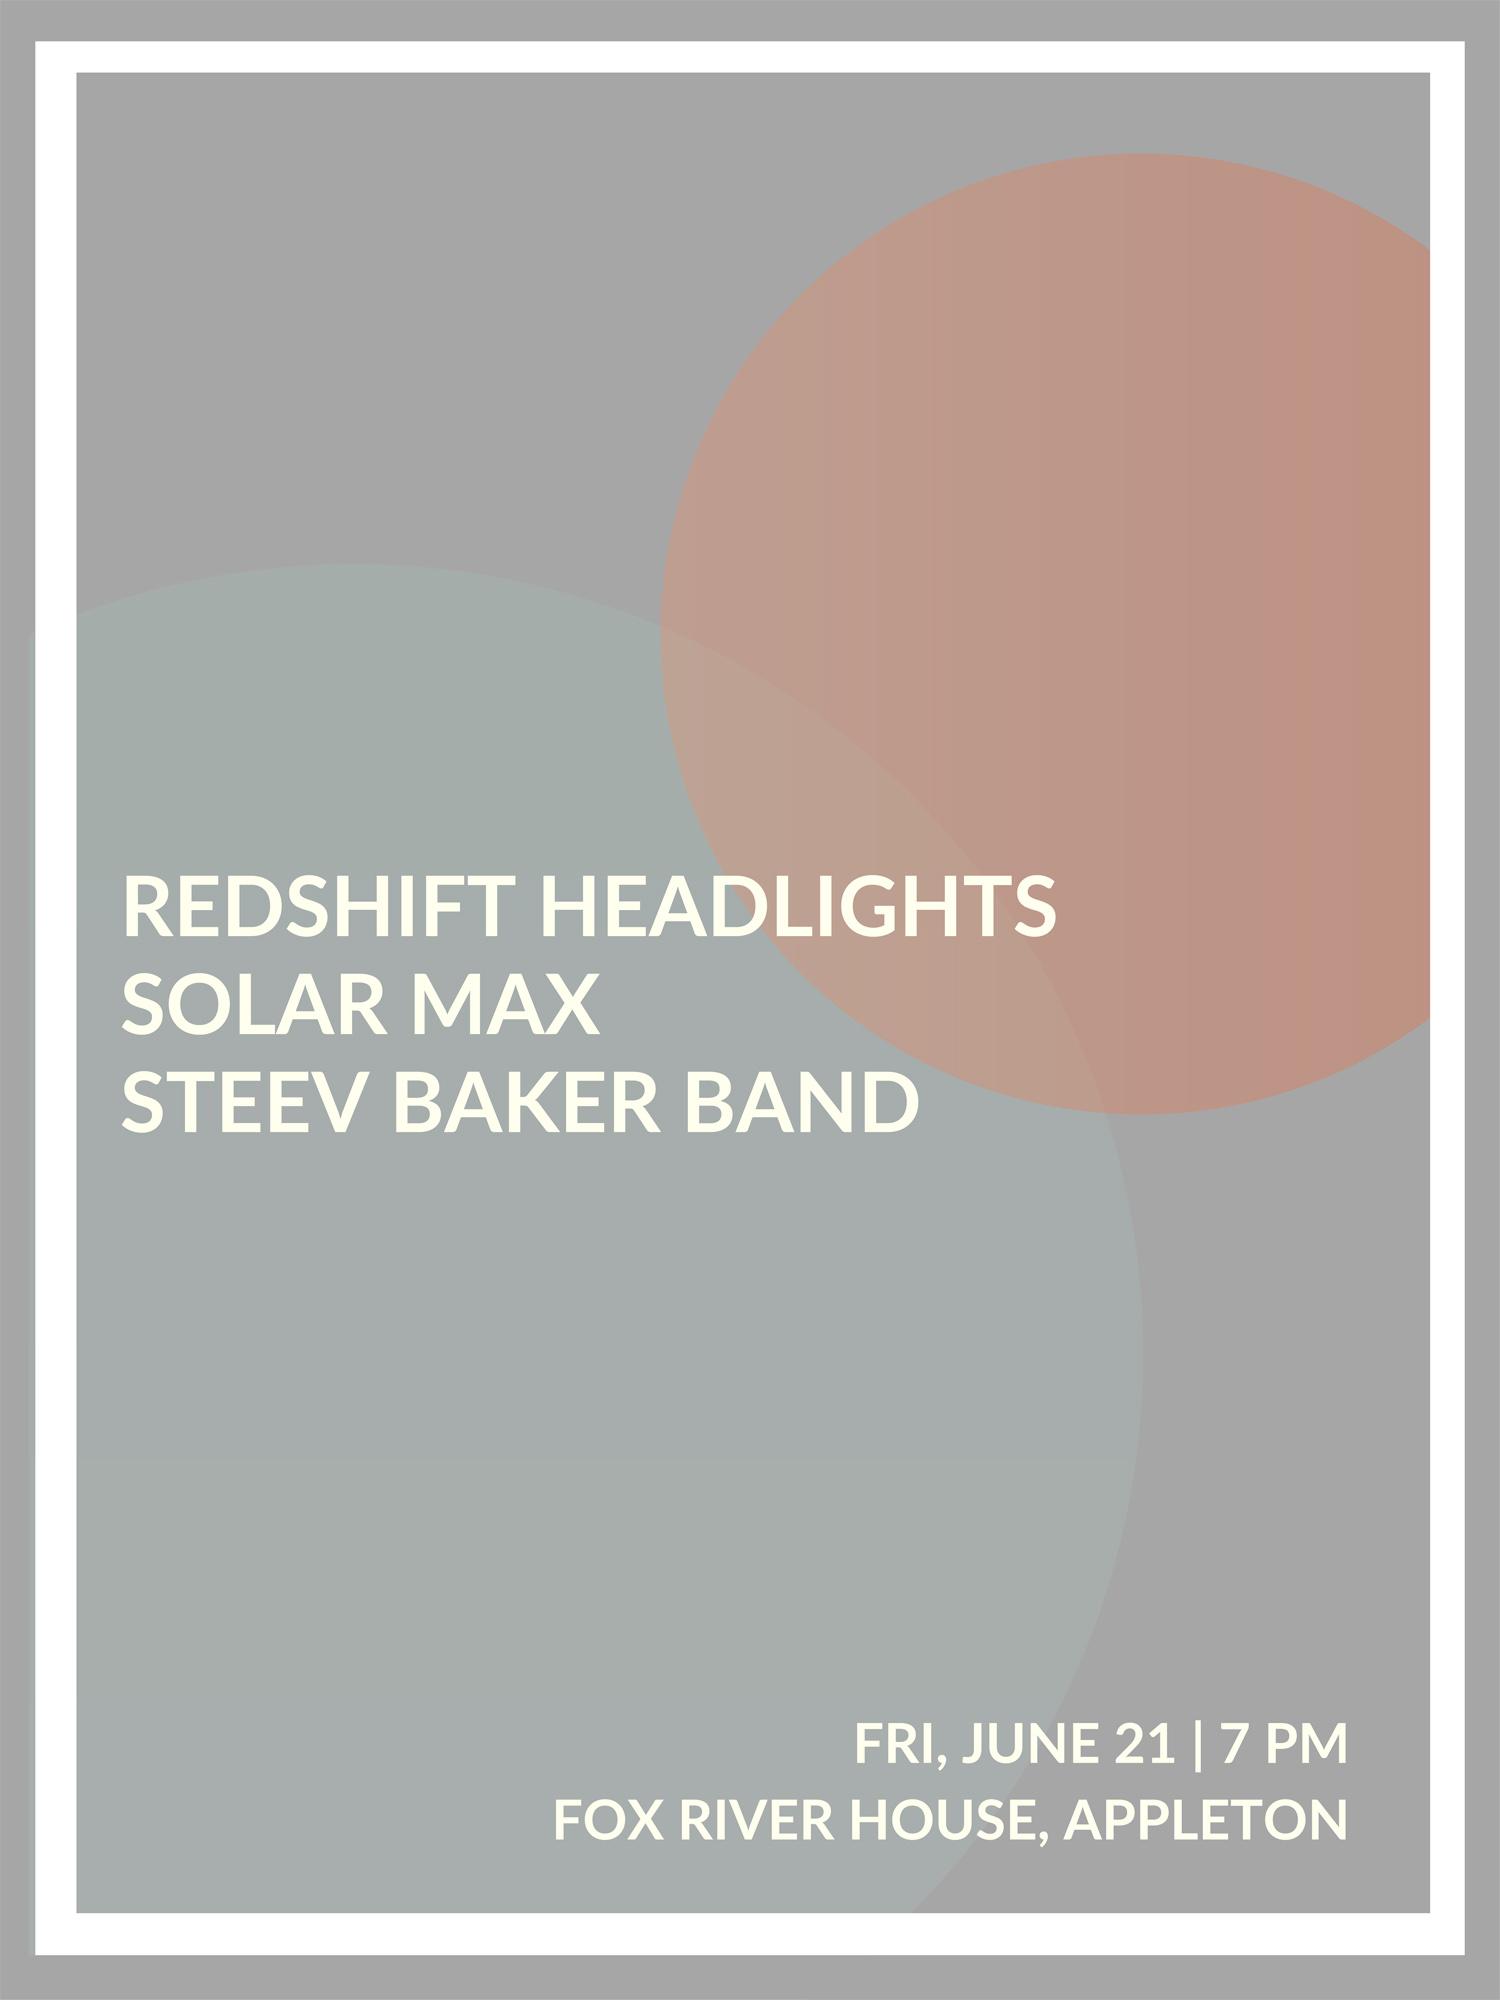 redshift-headlights-solar-max-steev-baker-band 2.jpg